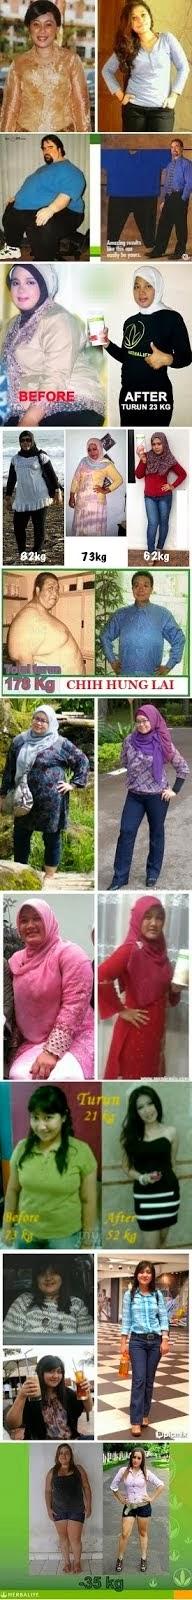 Dambaan Pria dan Wanita : Turun Berat Badan Agar Langsing